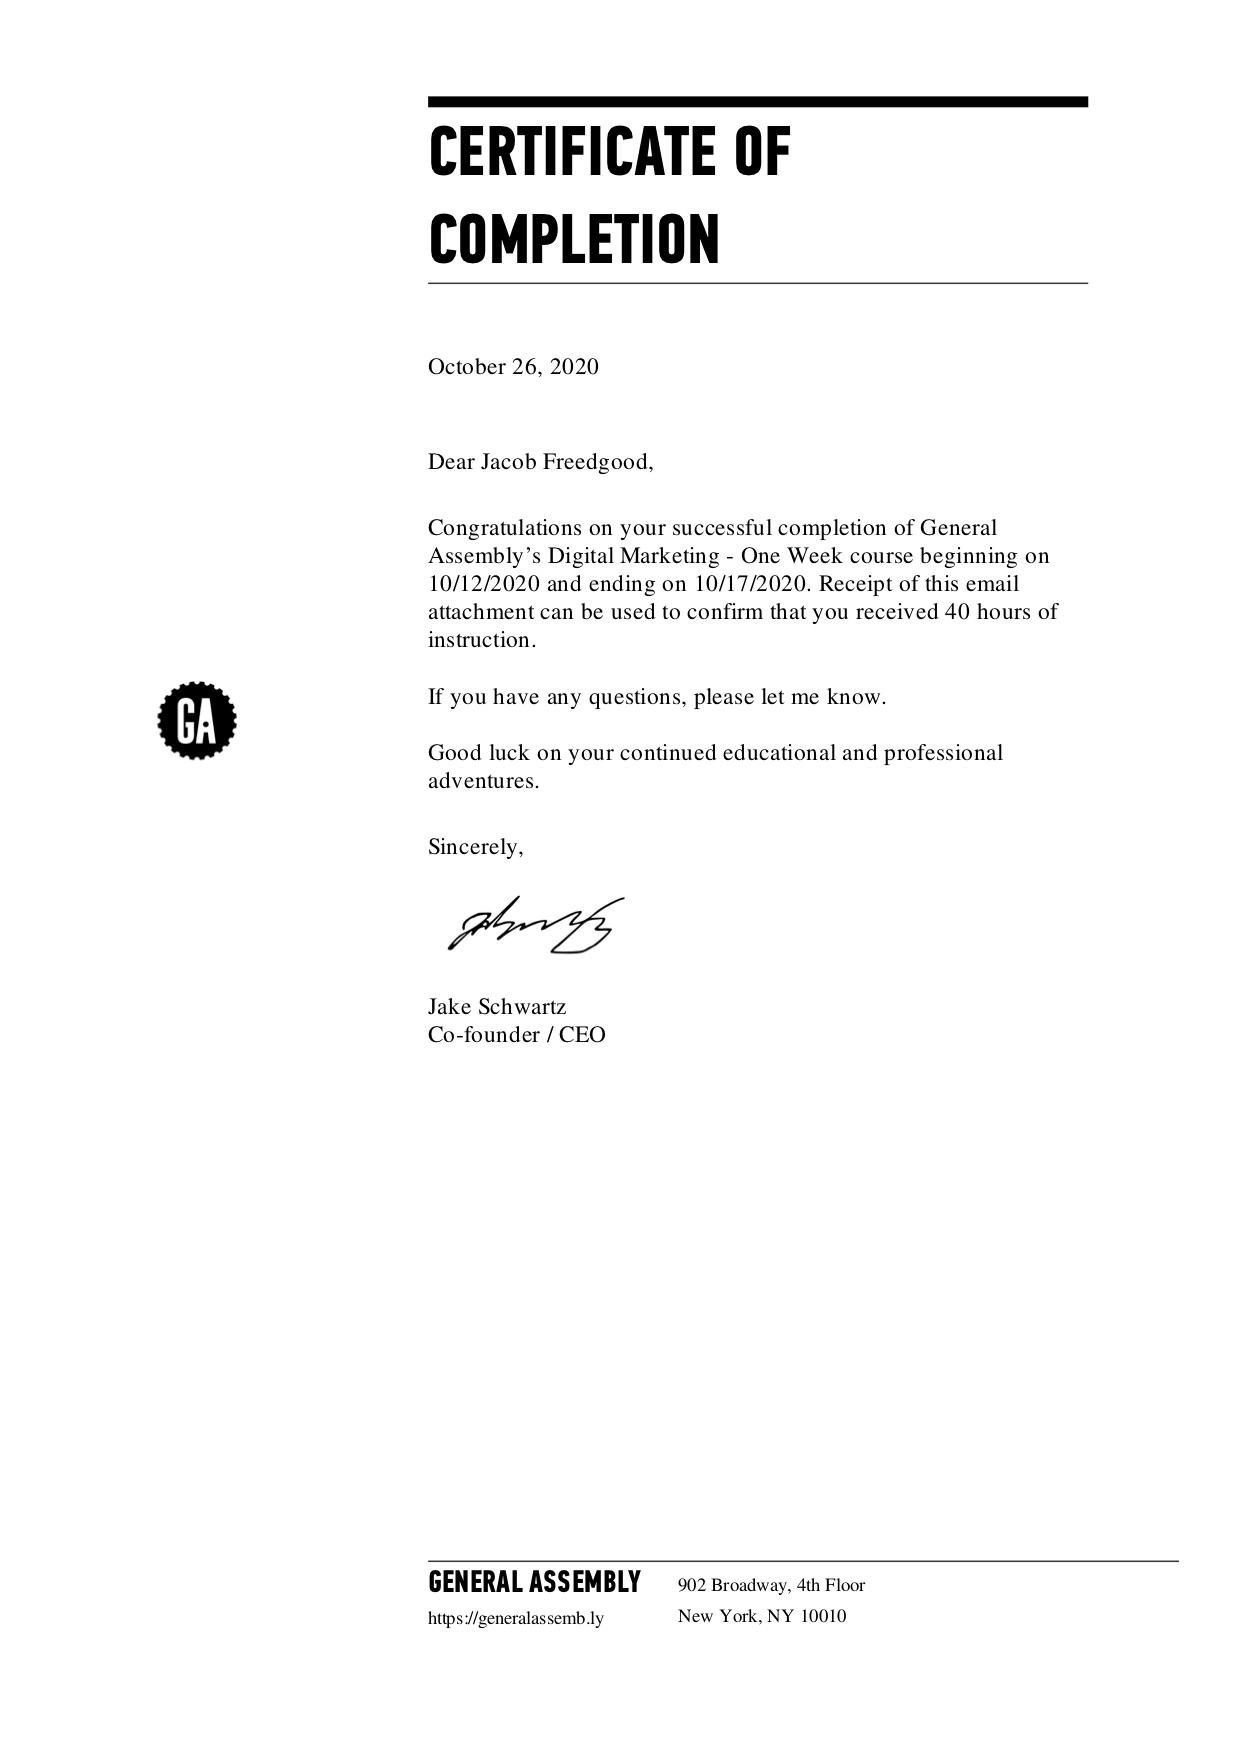 General Assembly Digital Marketing Certificate